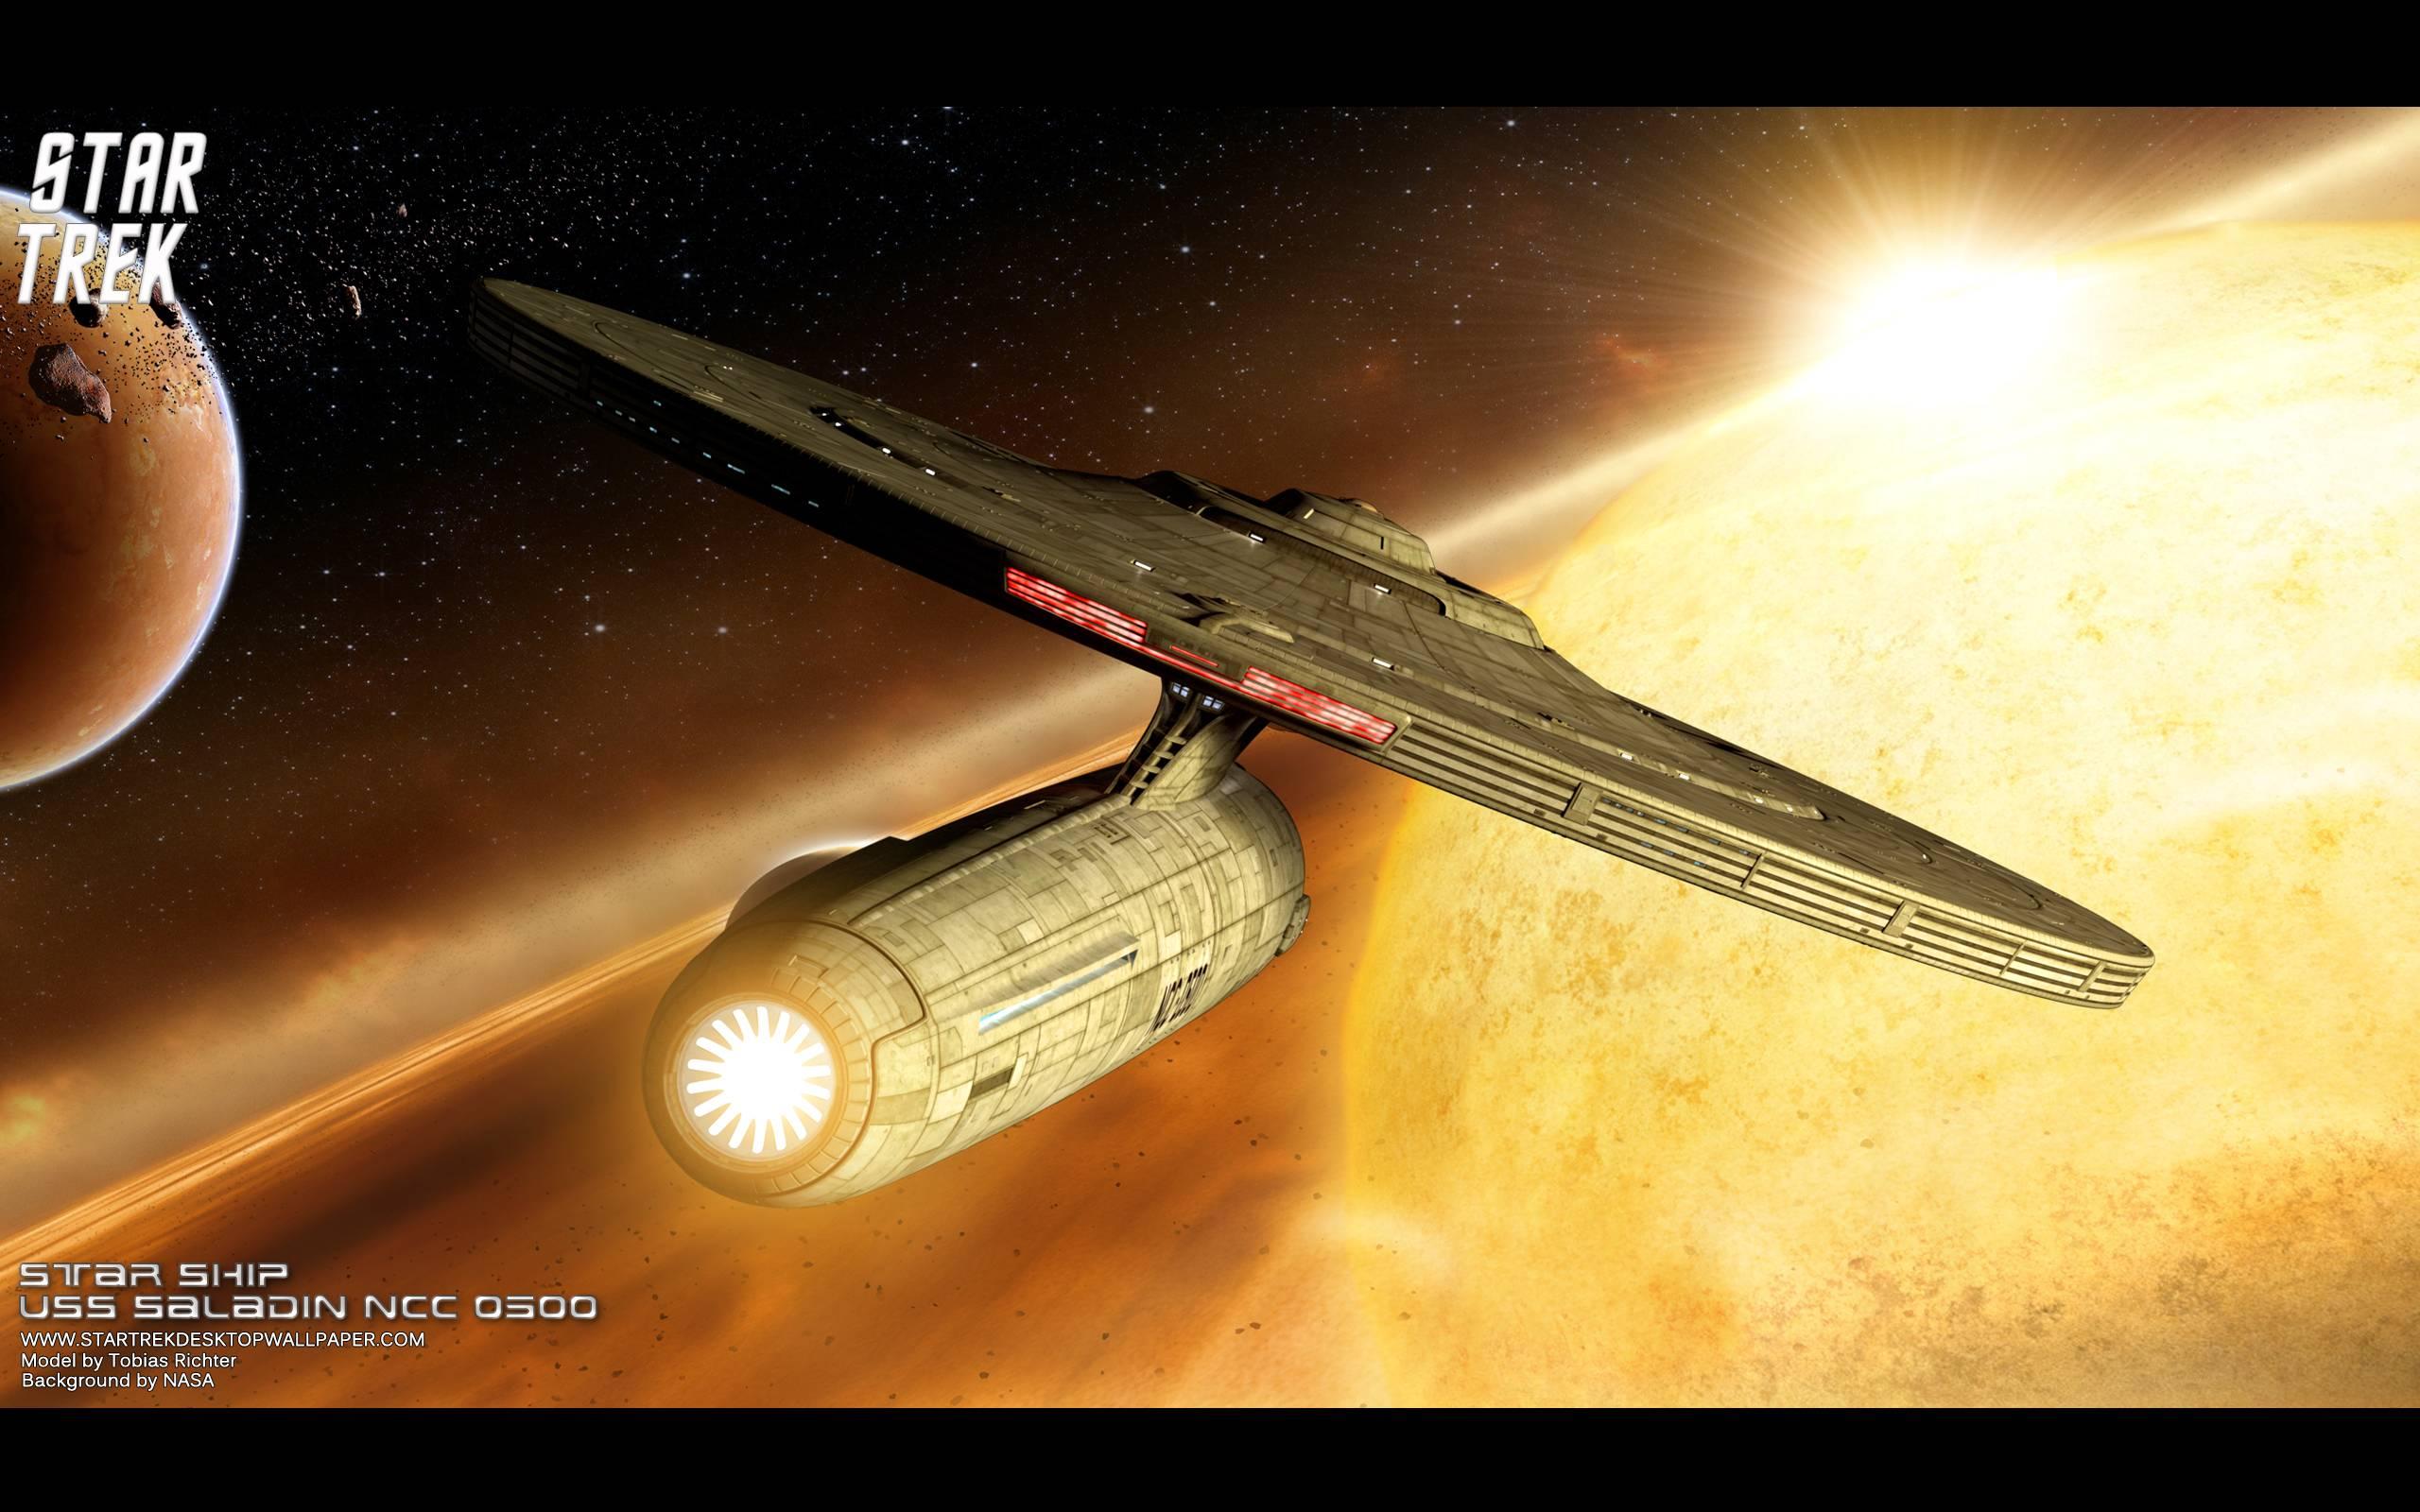 Star Trek Ship Wallpapers: Star Trek Ships Wallpapers